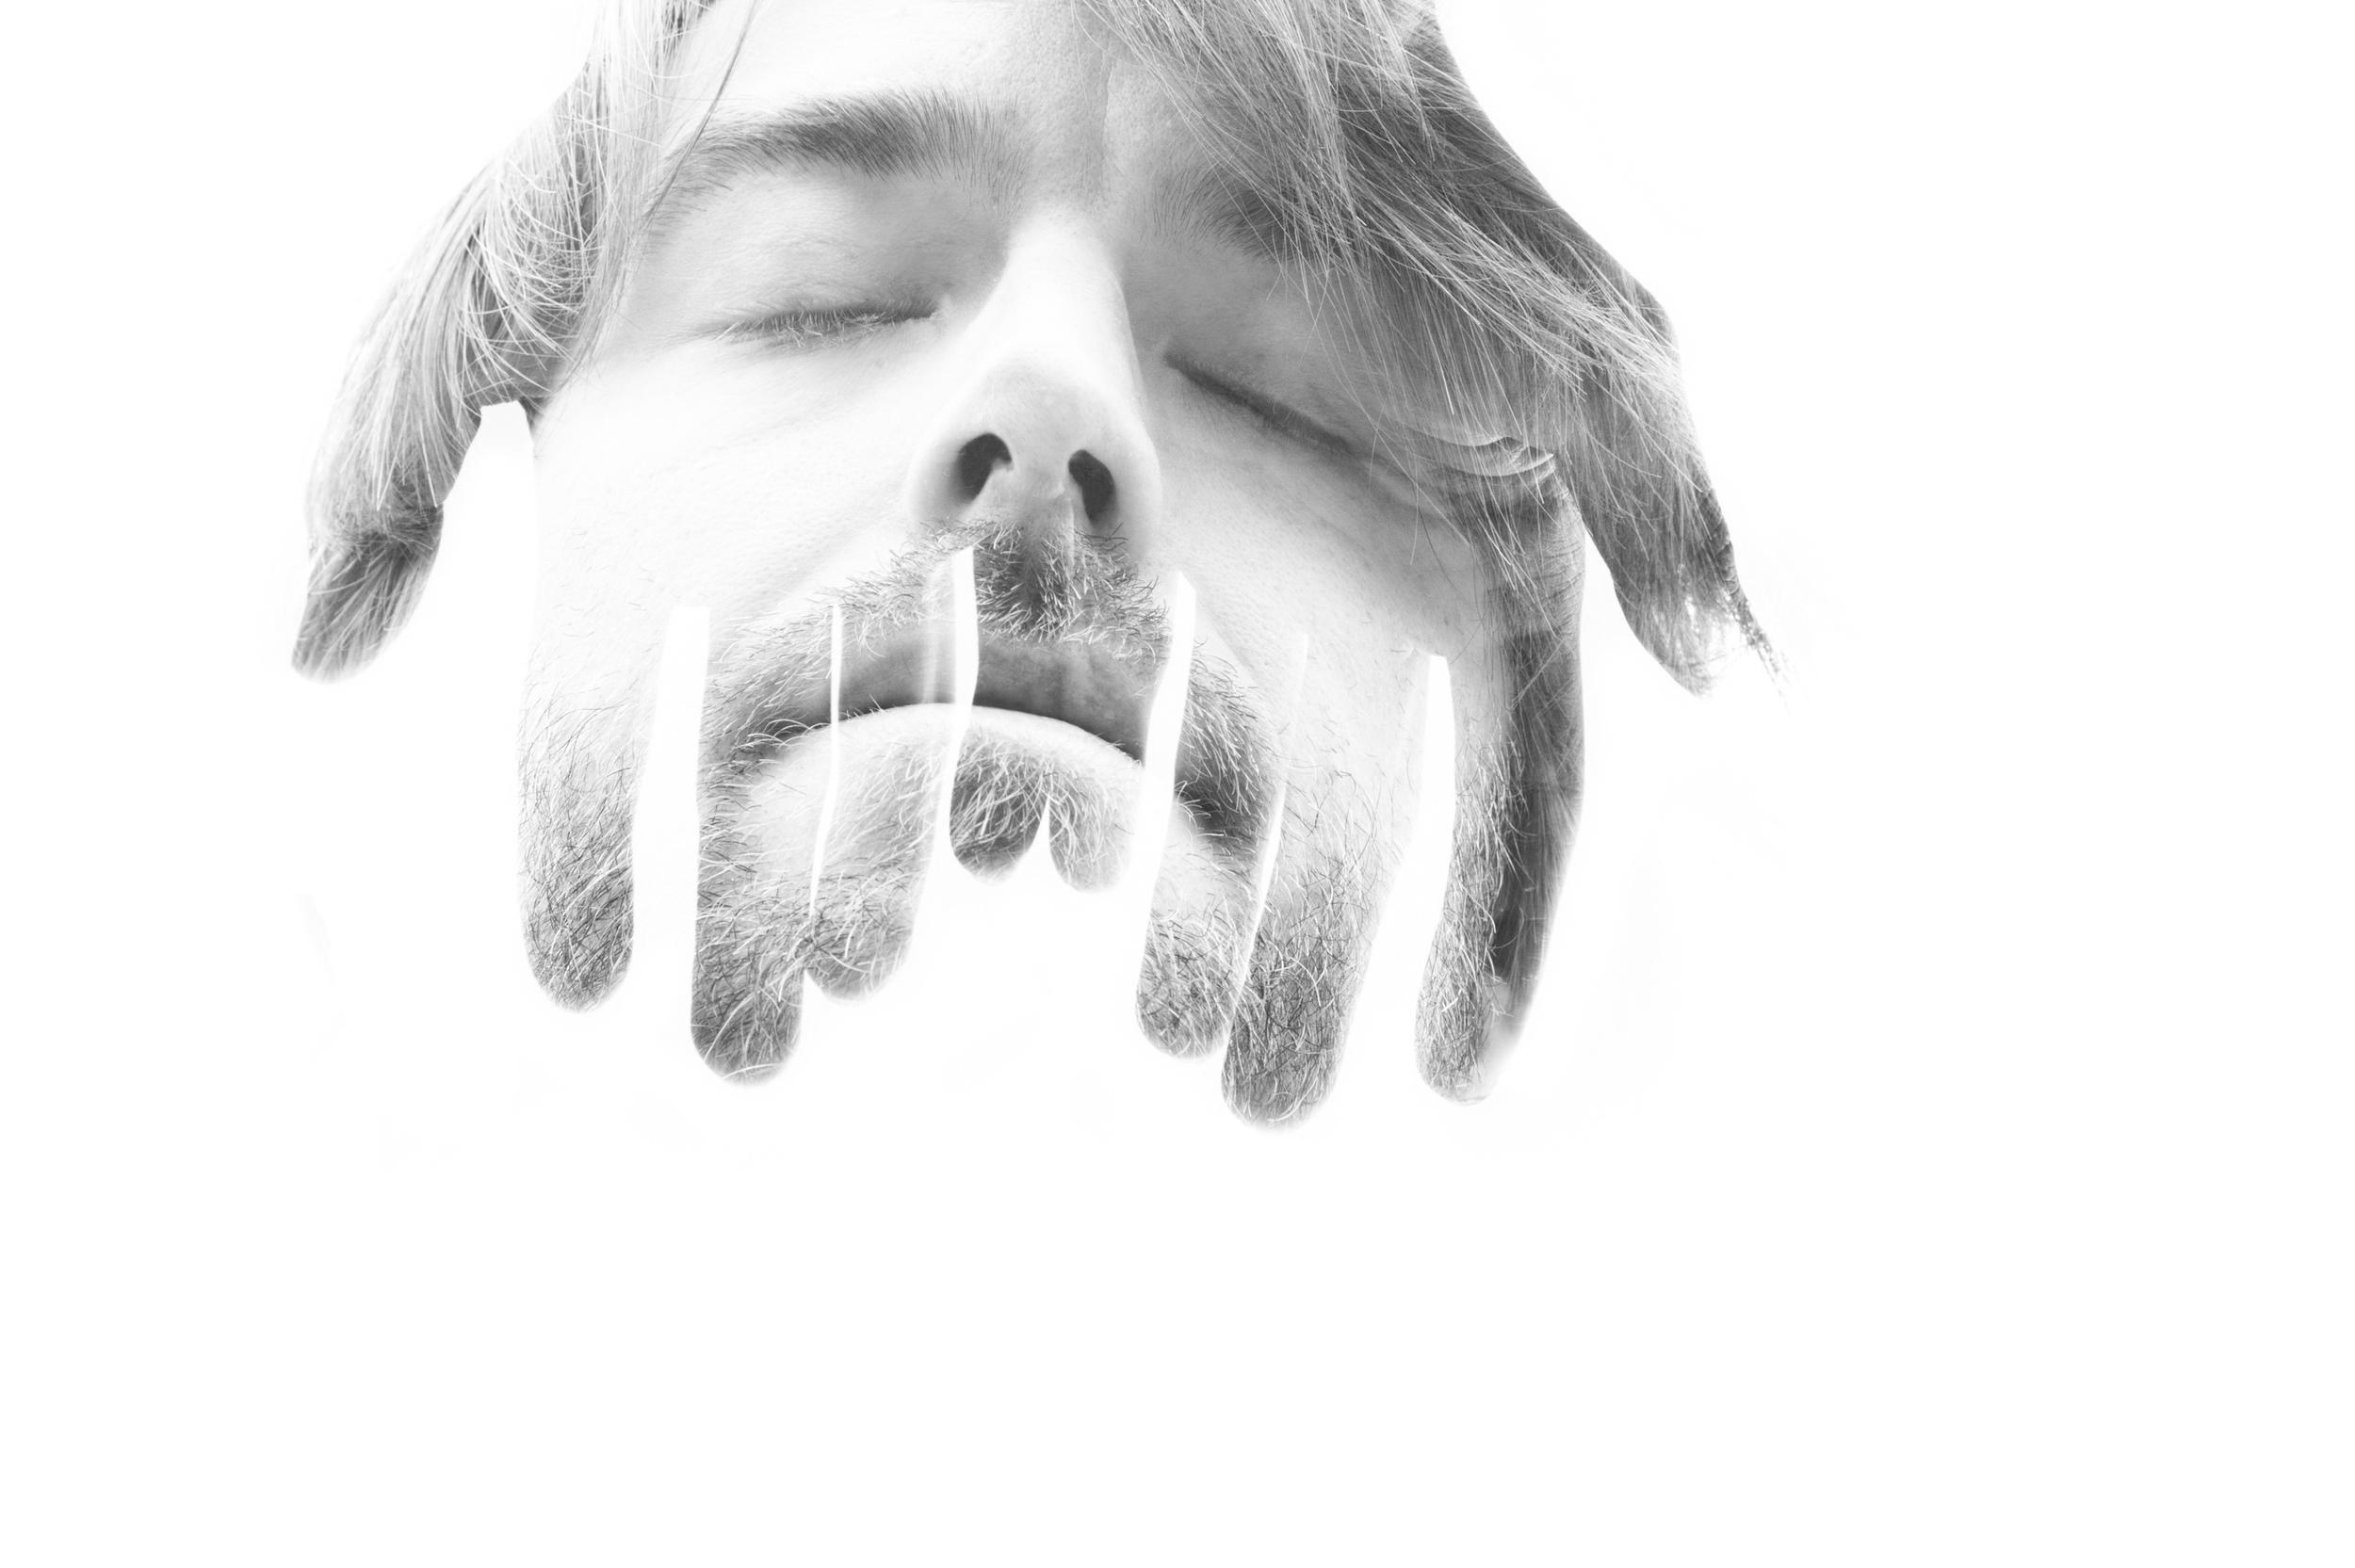 IMG_7832-Edit-Edit.JPG